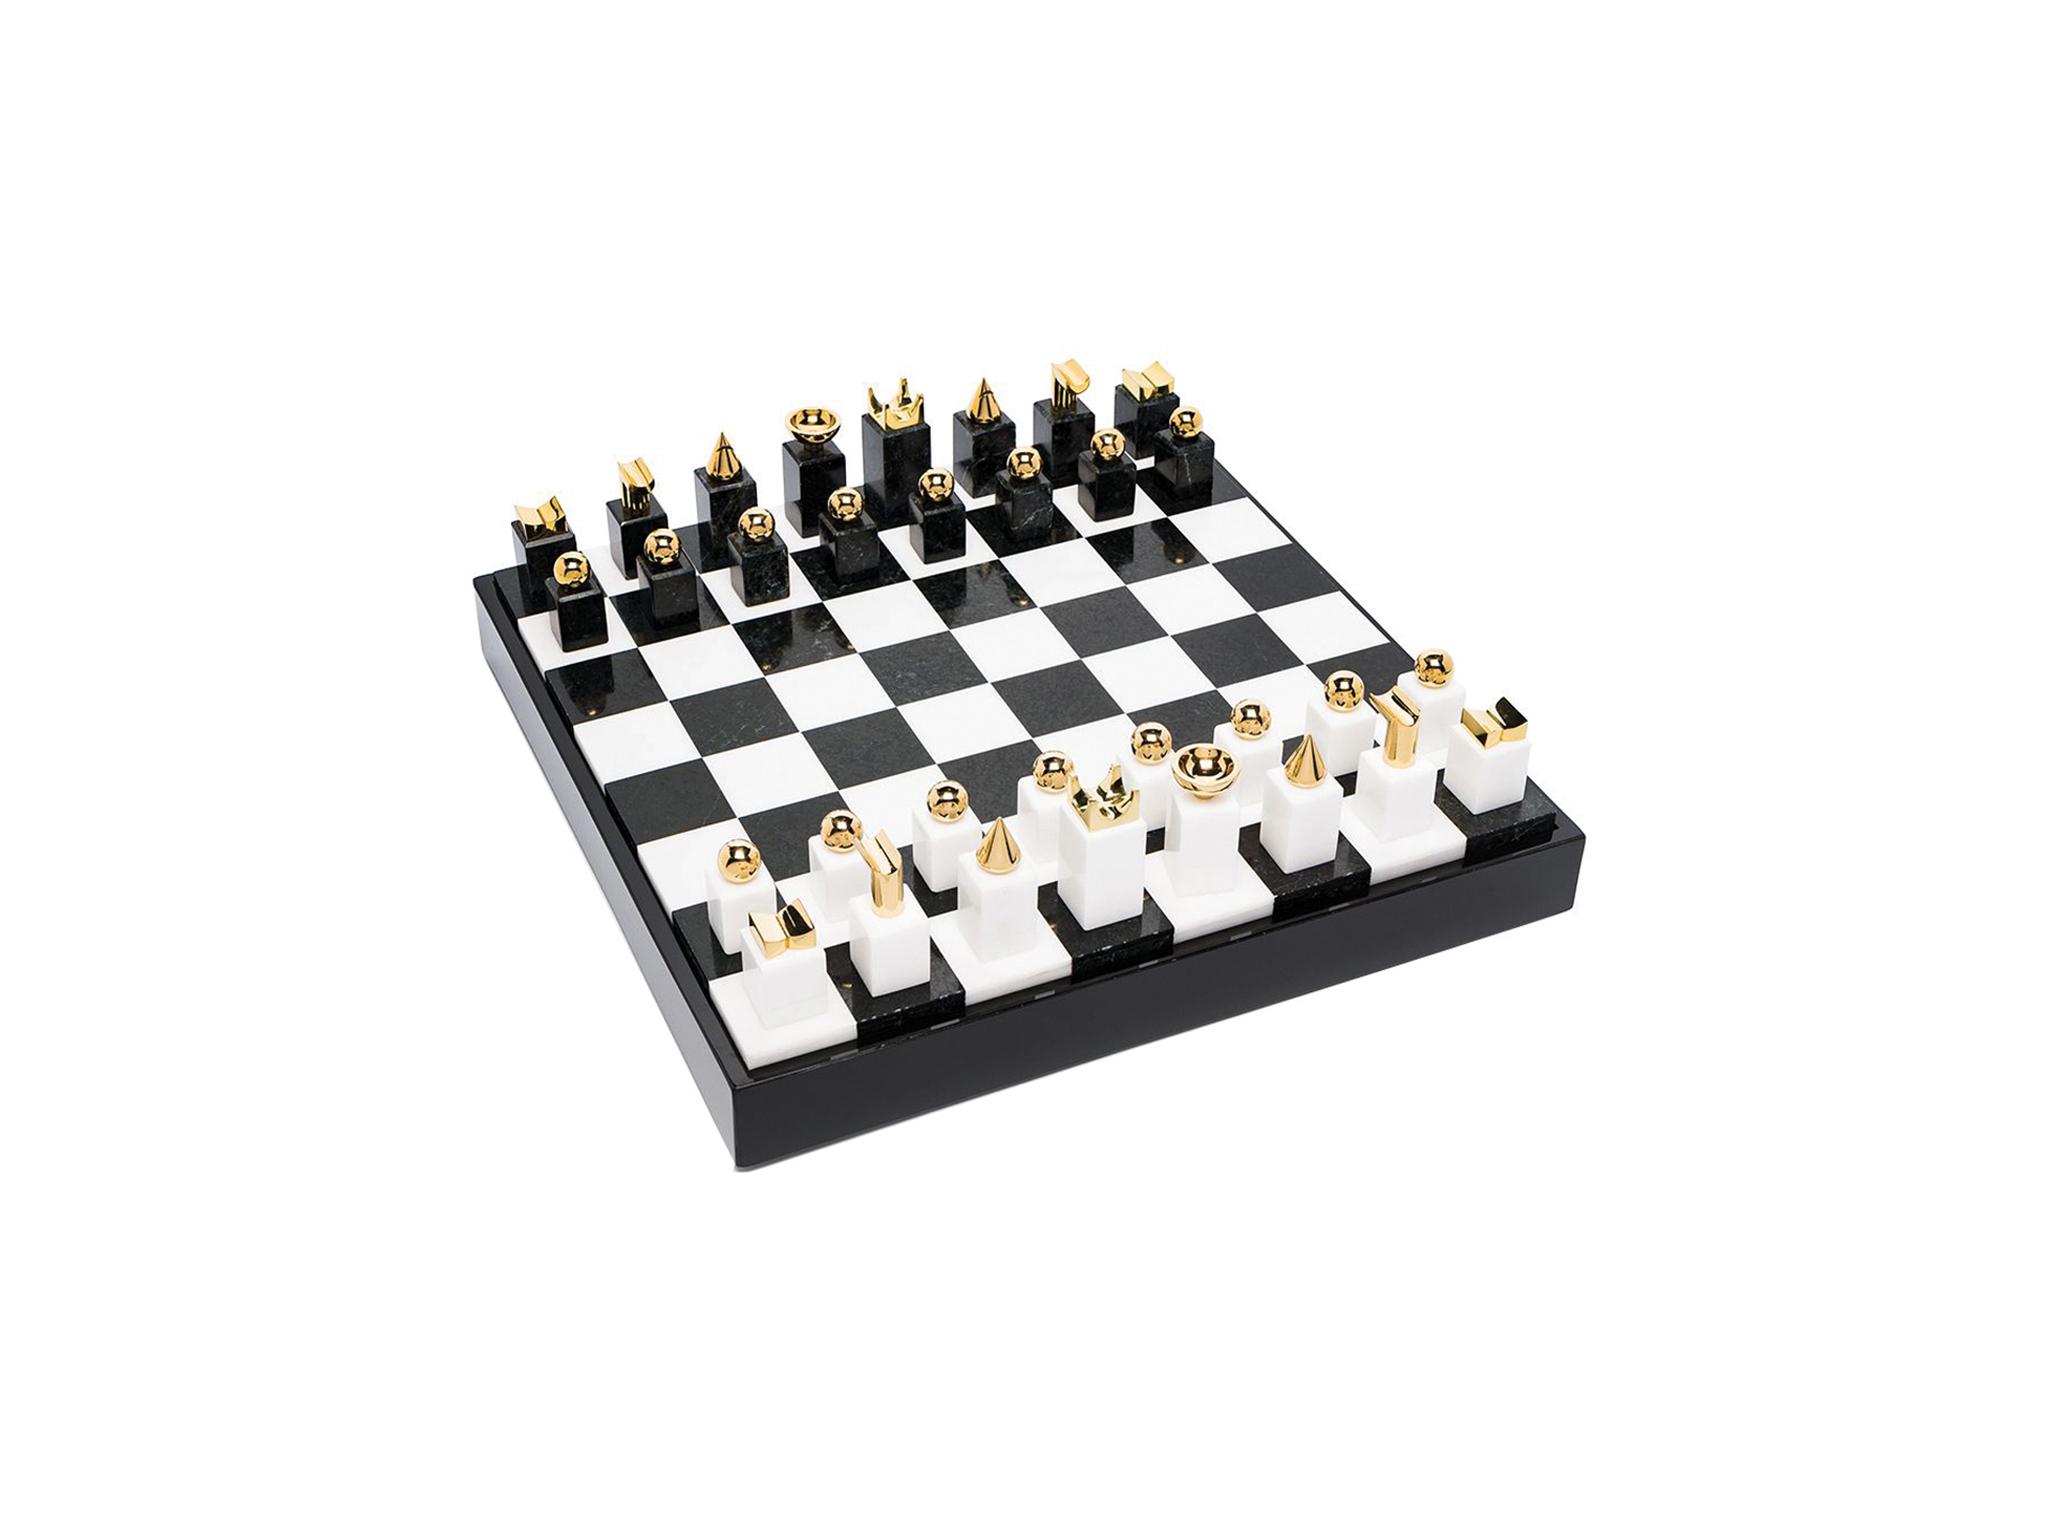 Jogos, Design, Tabuleiro de Xadrez, L'Objet